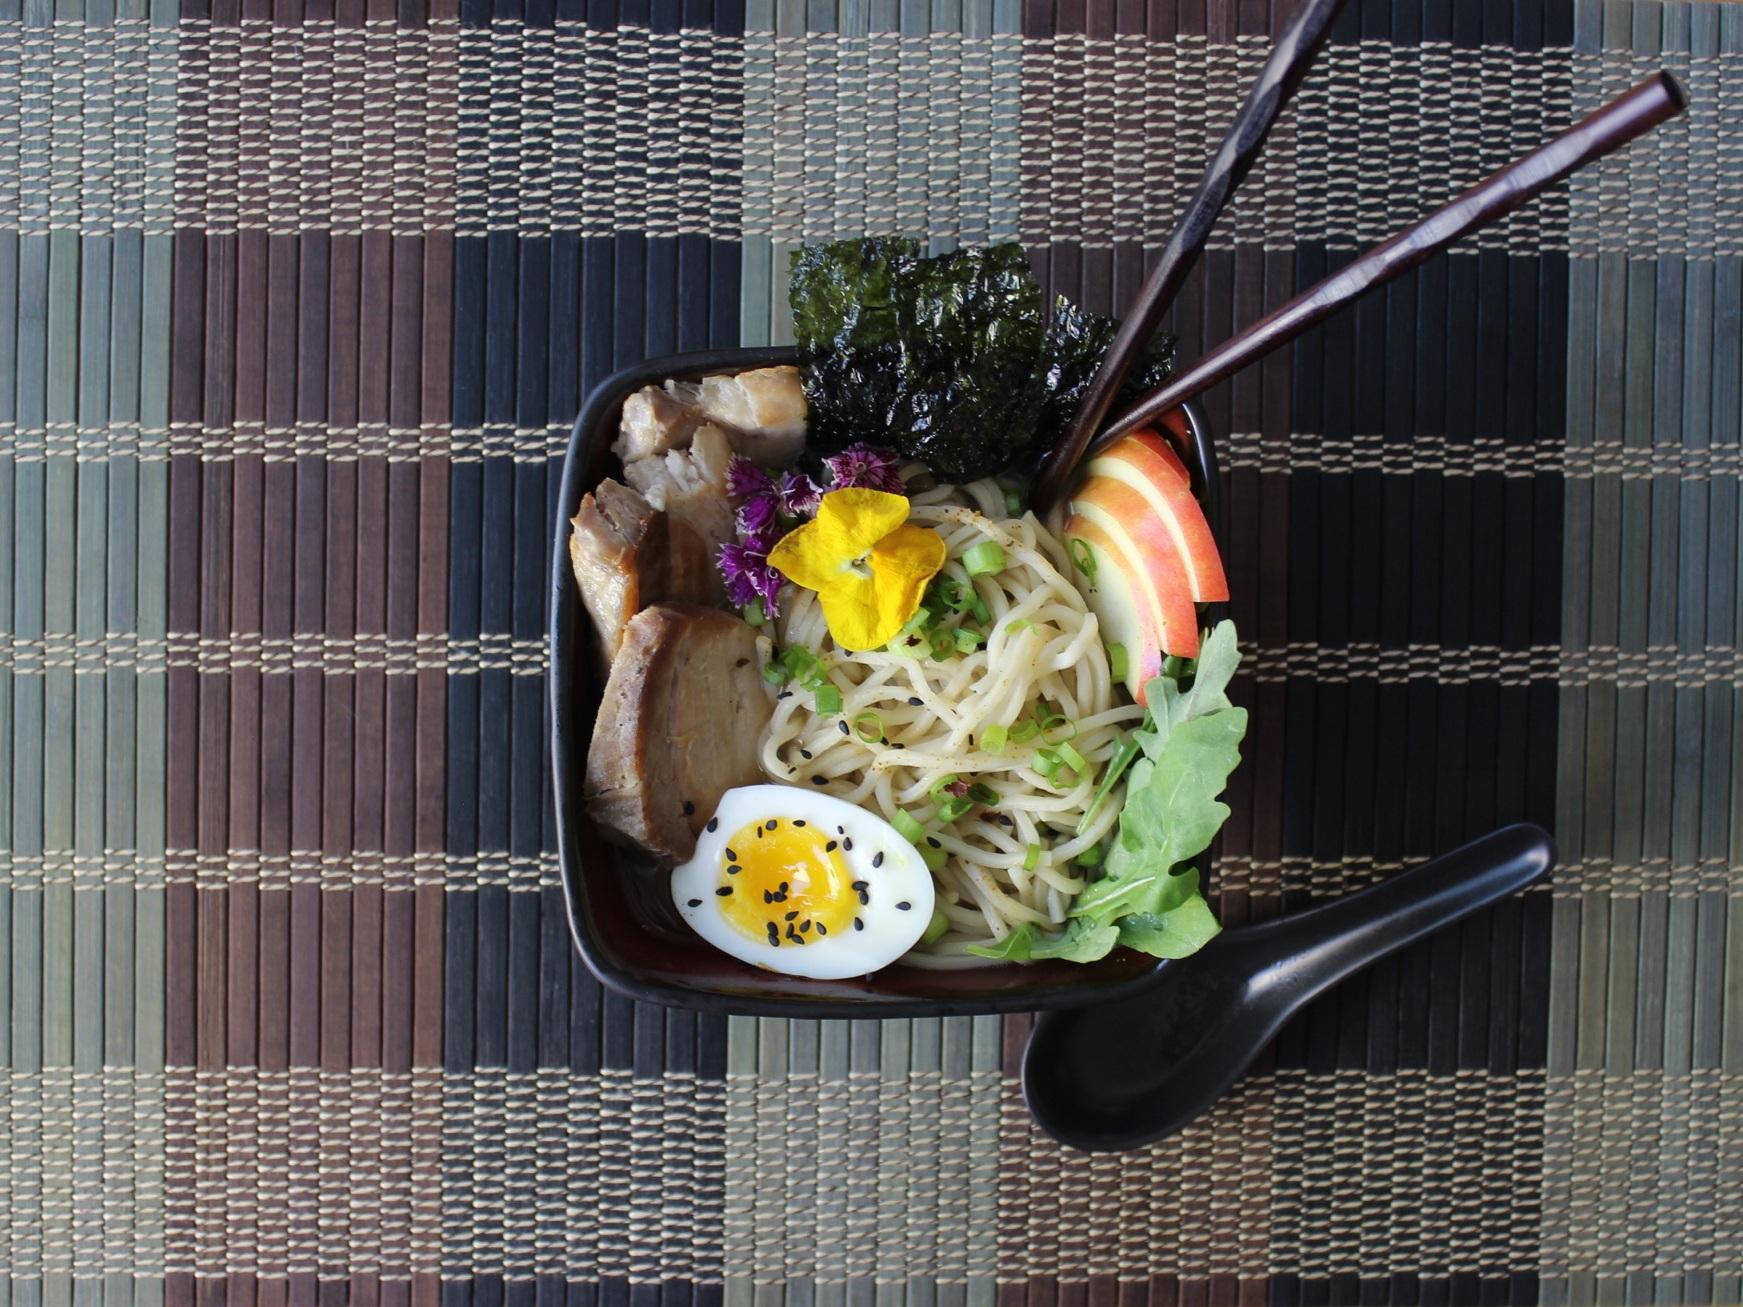 Miso Veggie Ramen Kit    prepared with soft-boiled egg, black sesame seeds, pan-fried pork, nori, apples, arugula, green onions, and edible flowers to garnish.